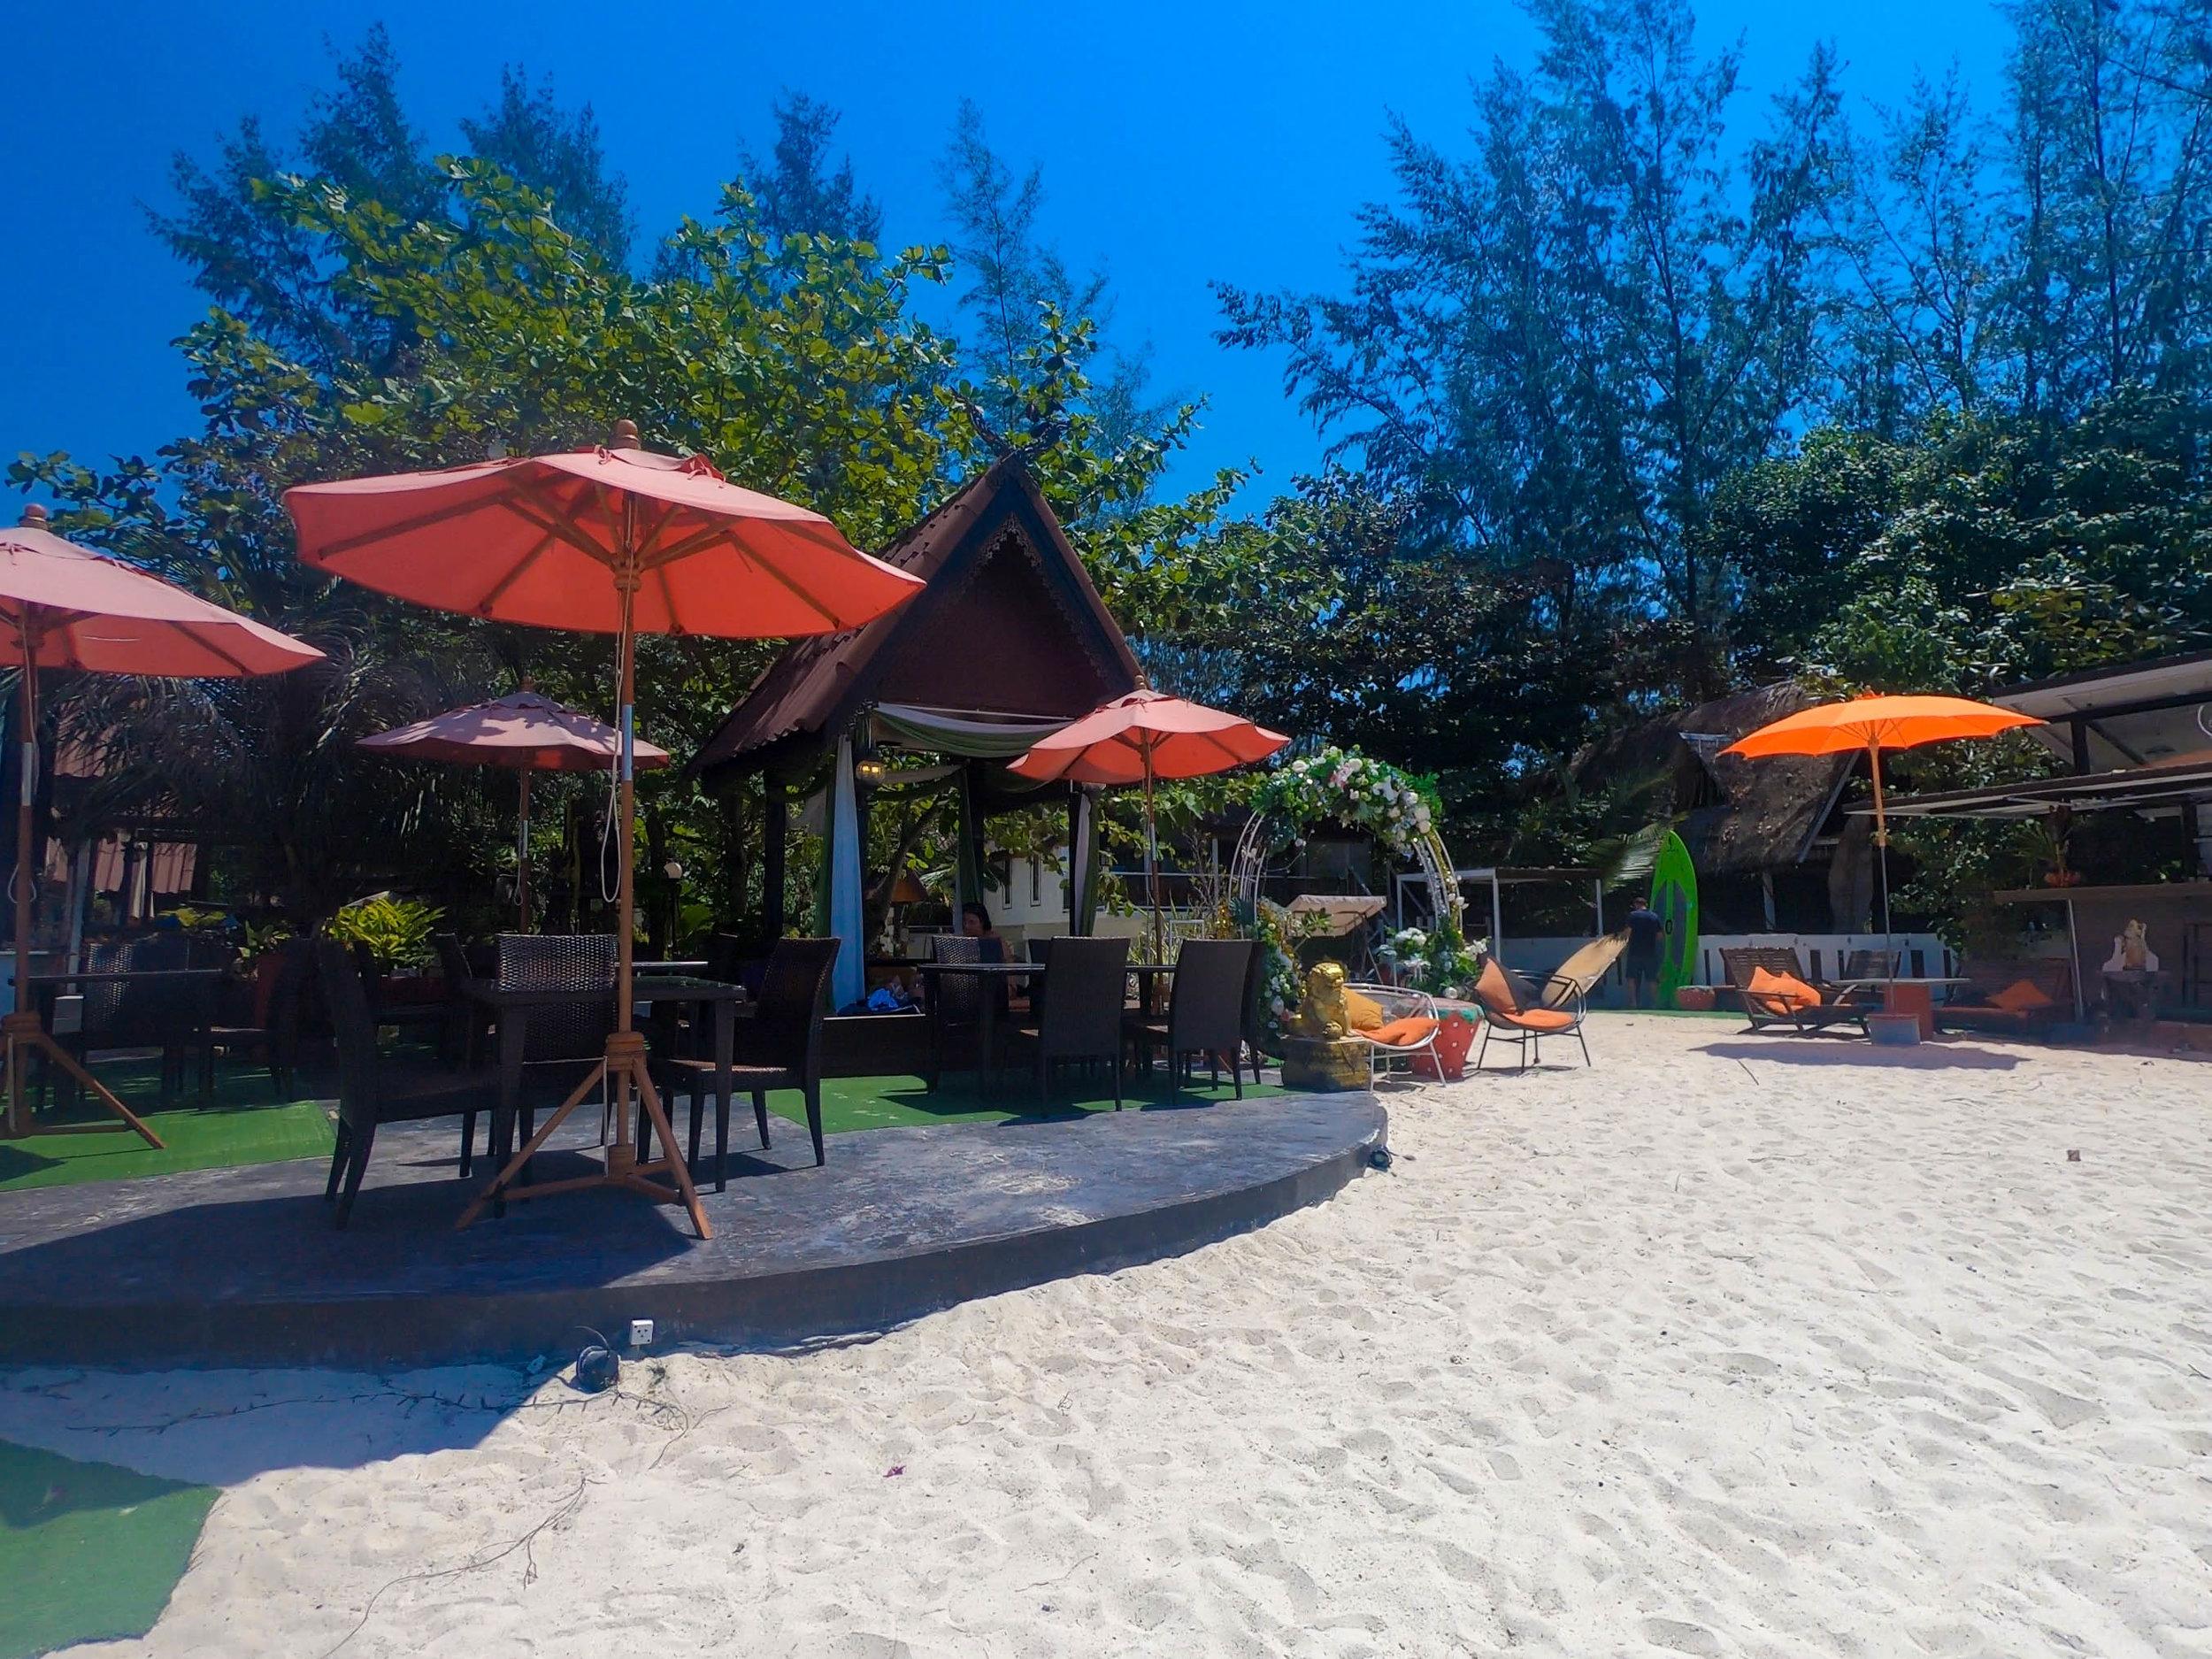 jungle-hooping-koh-pangan-thailand-resort-location_Numero seriale a 2 cifre_7.JPG